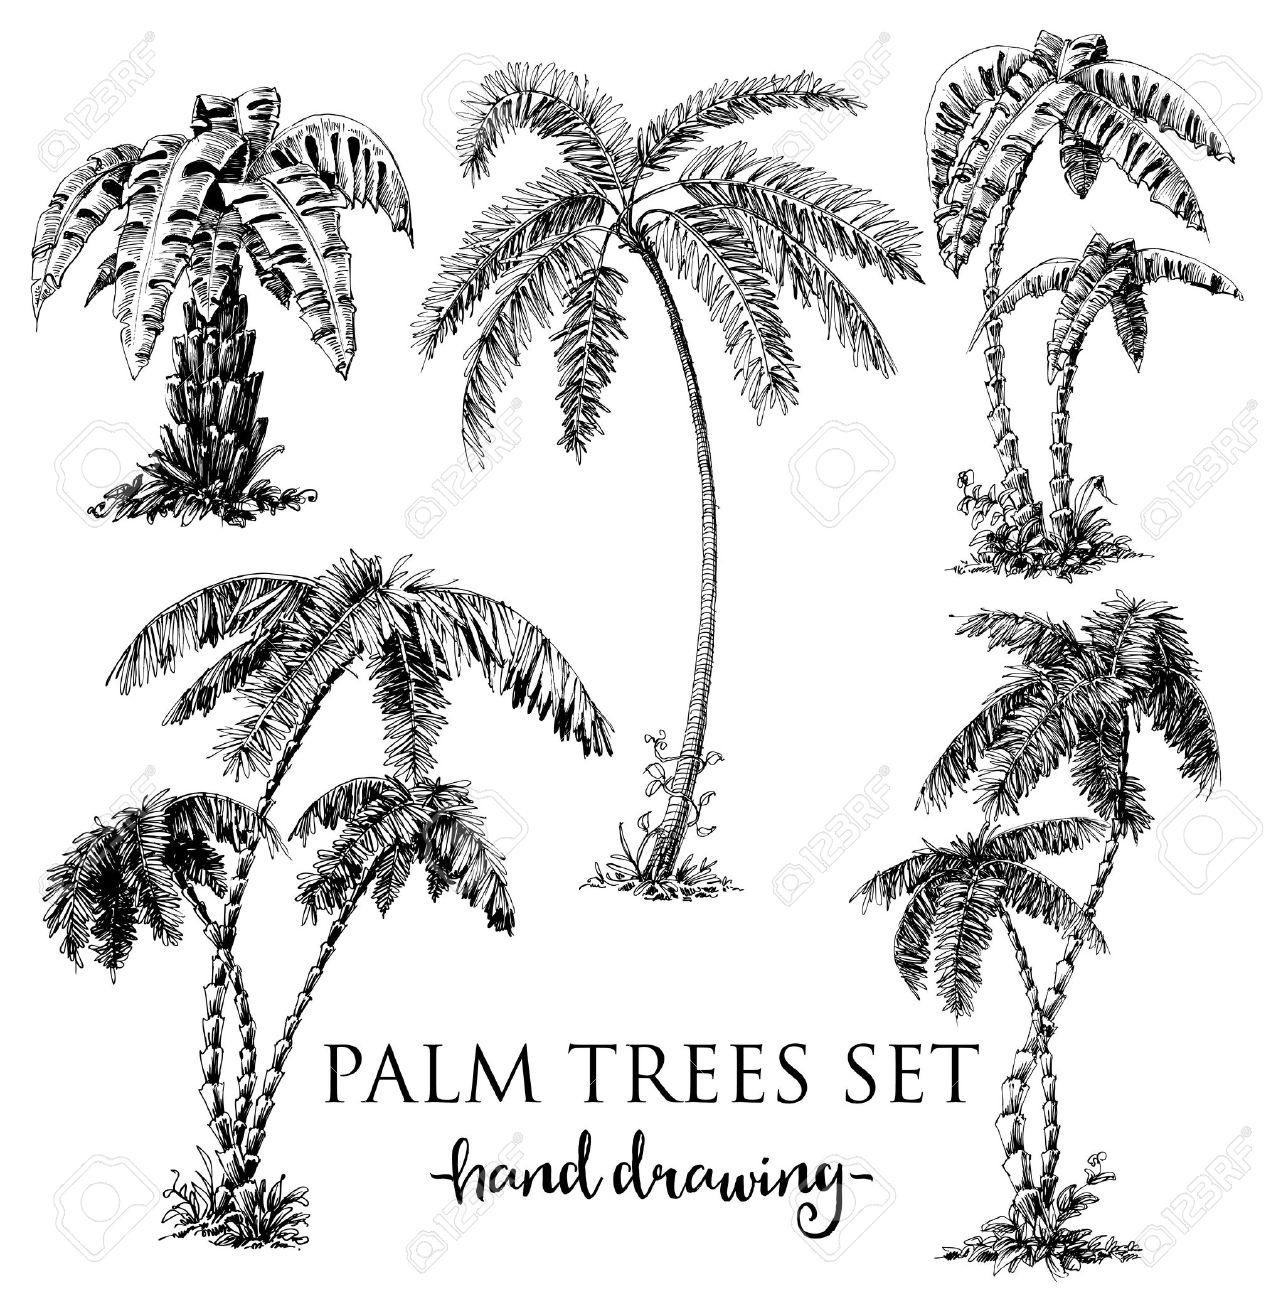 Detailed palm trees set - 43124915